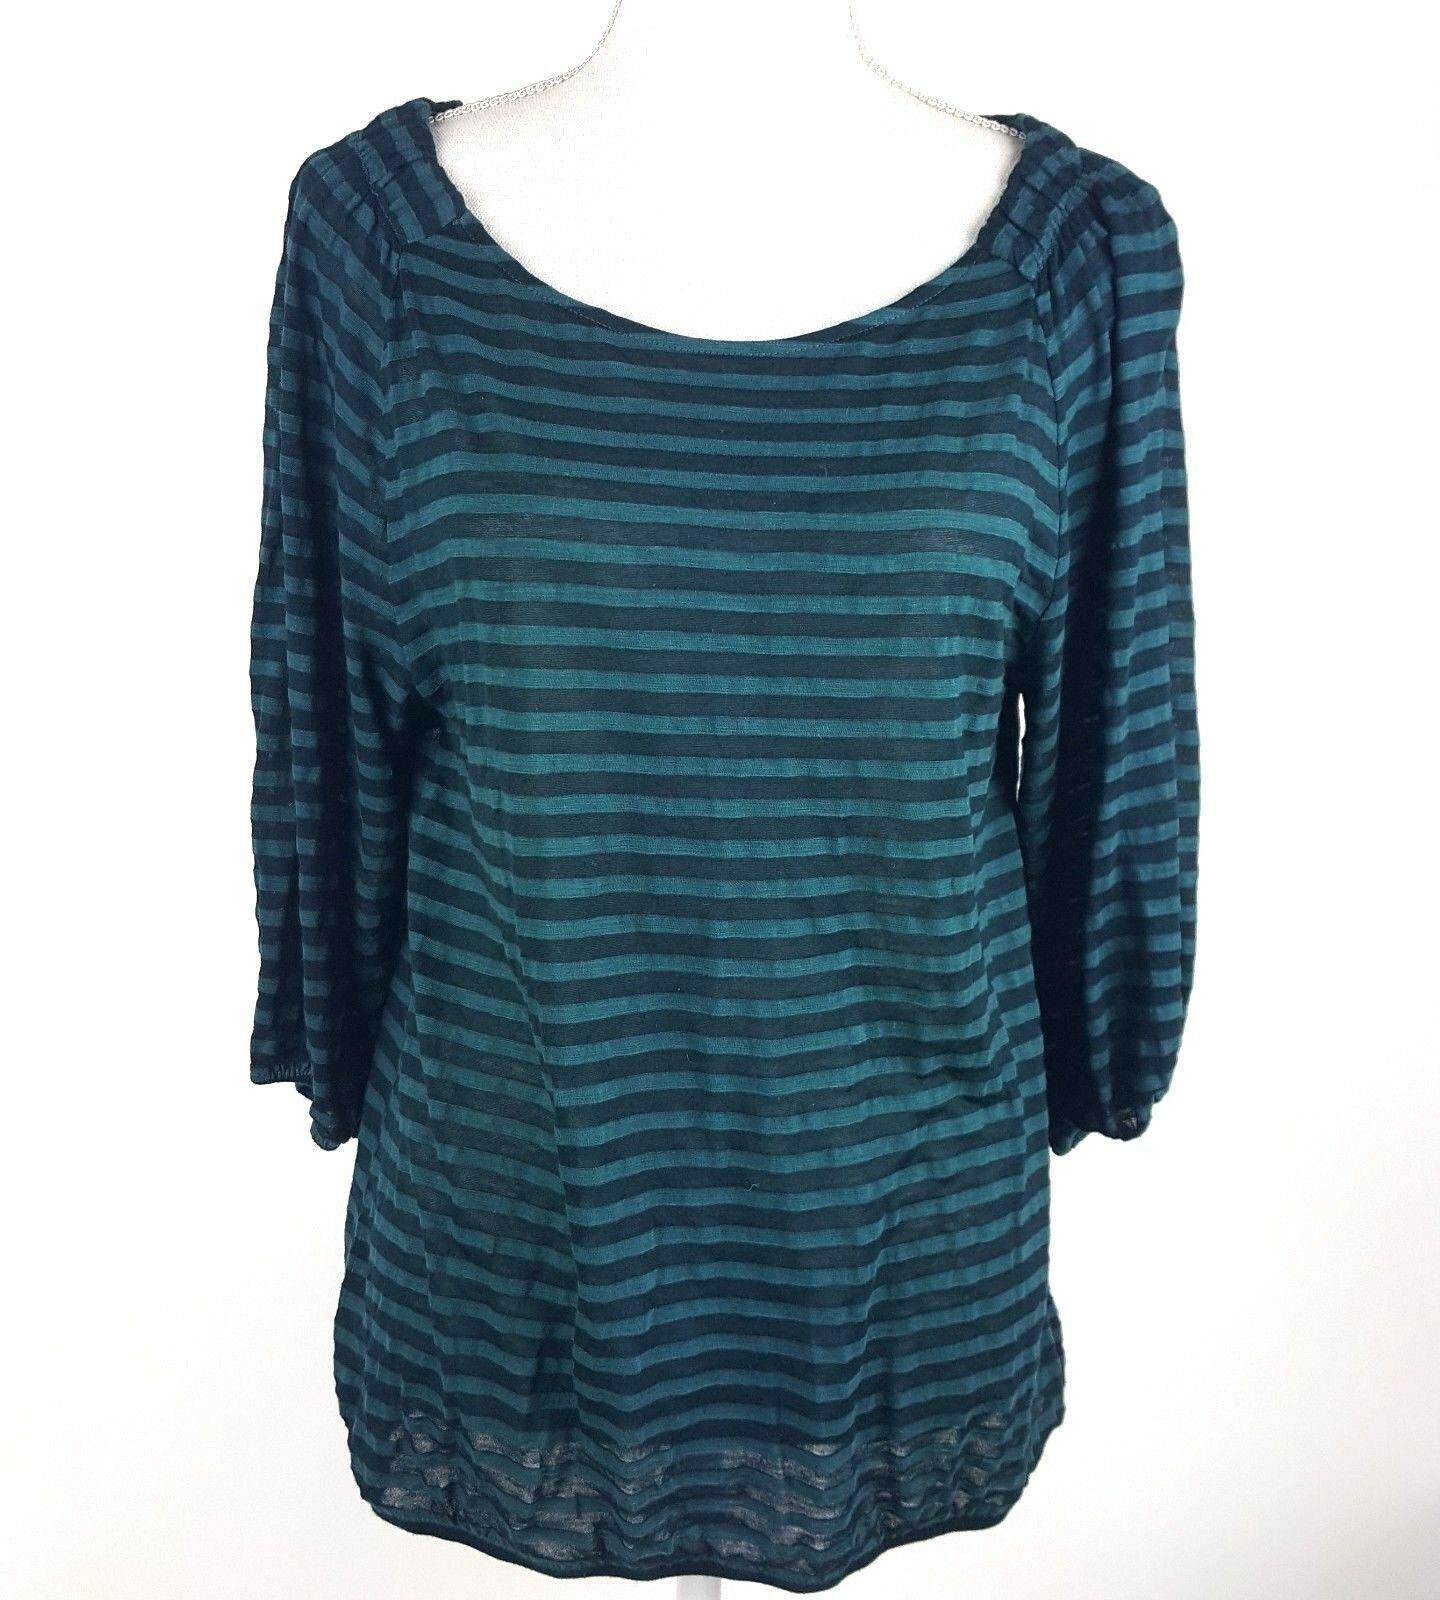 6a4b044c Ann Taylor Loft Women Sz Medium Green Stripe 3/4 Sleeve Sheer Blouse Rayon  Blend - $13.09